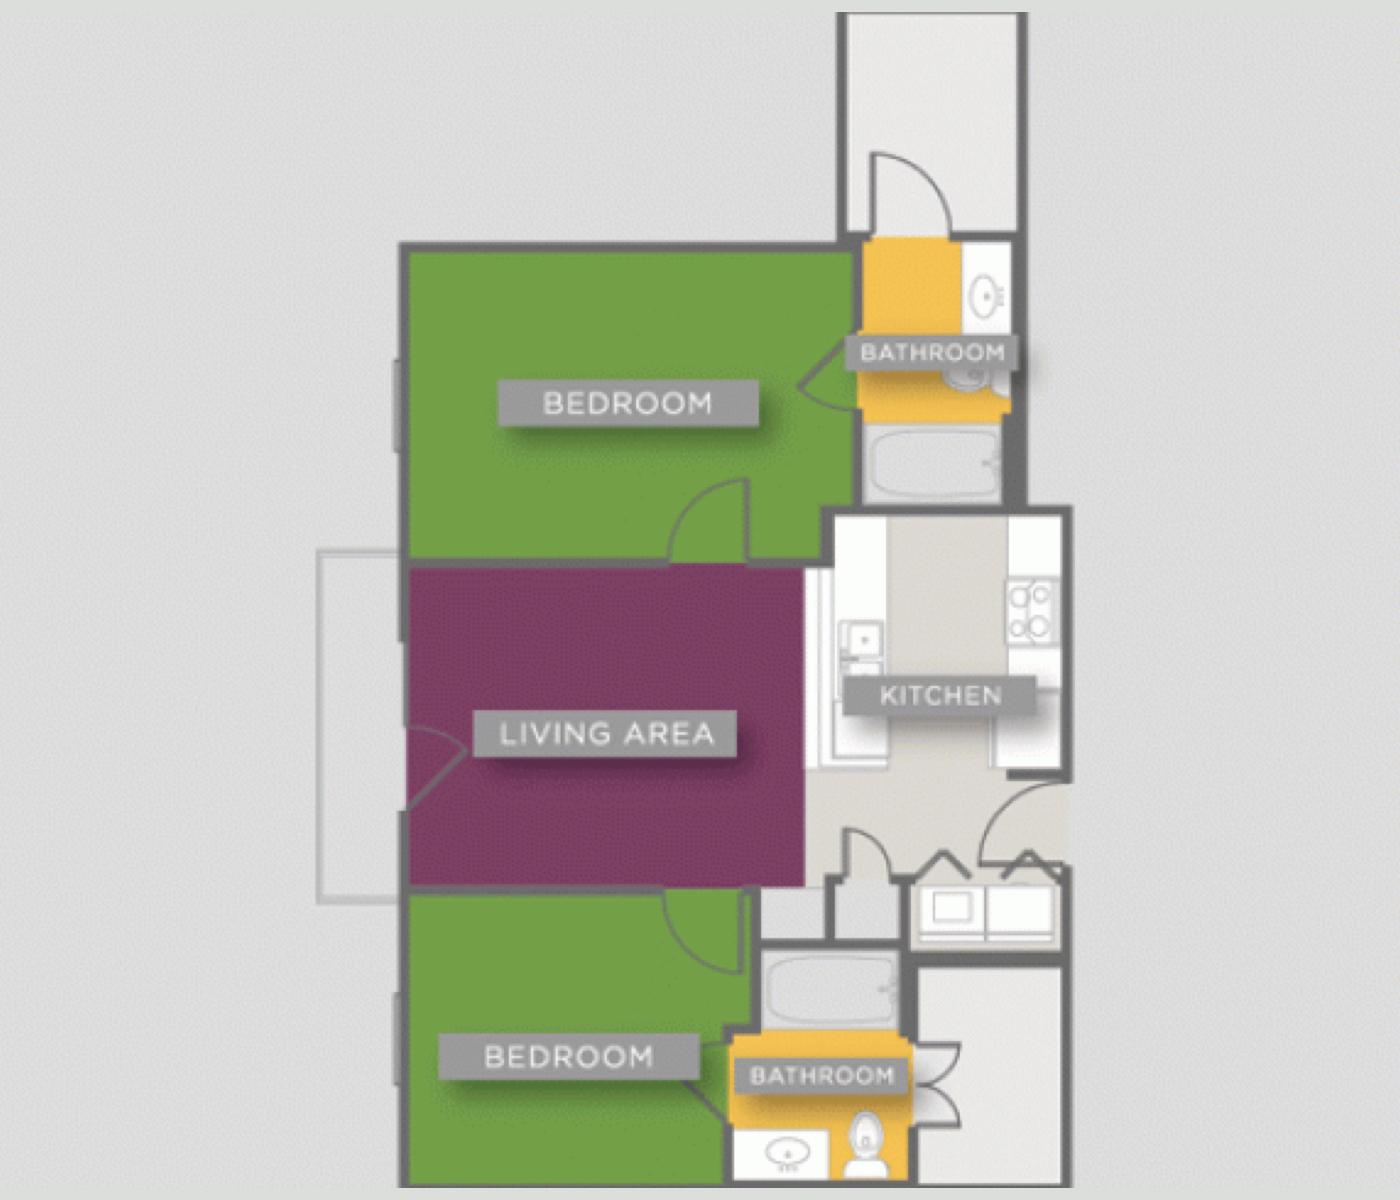 Loft-Vue-student-housing-Chisolm